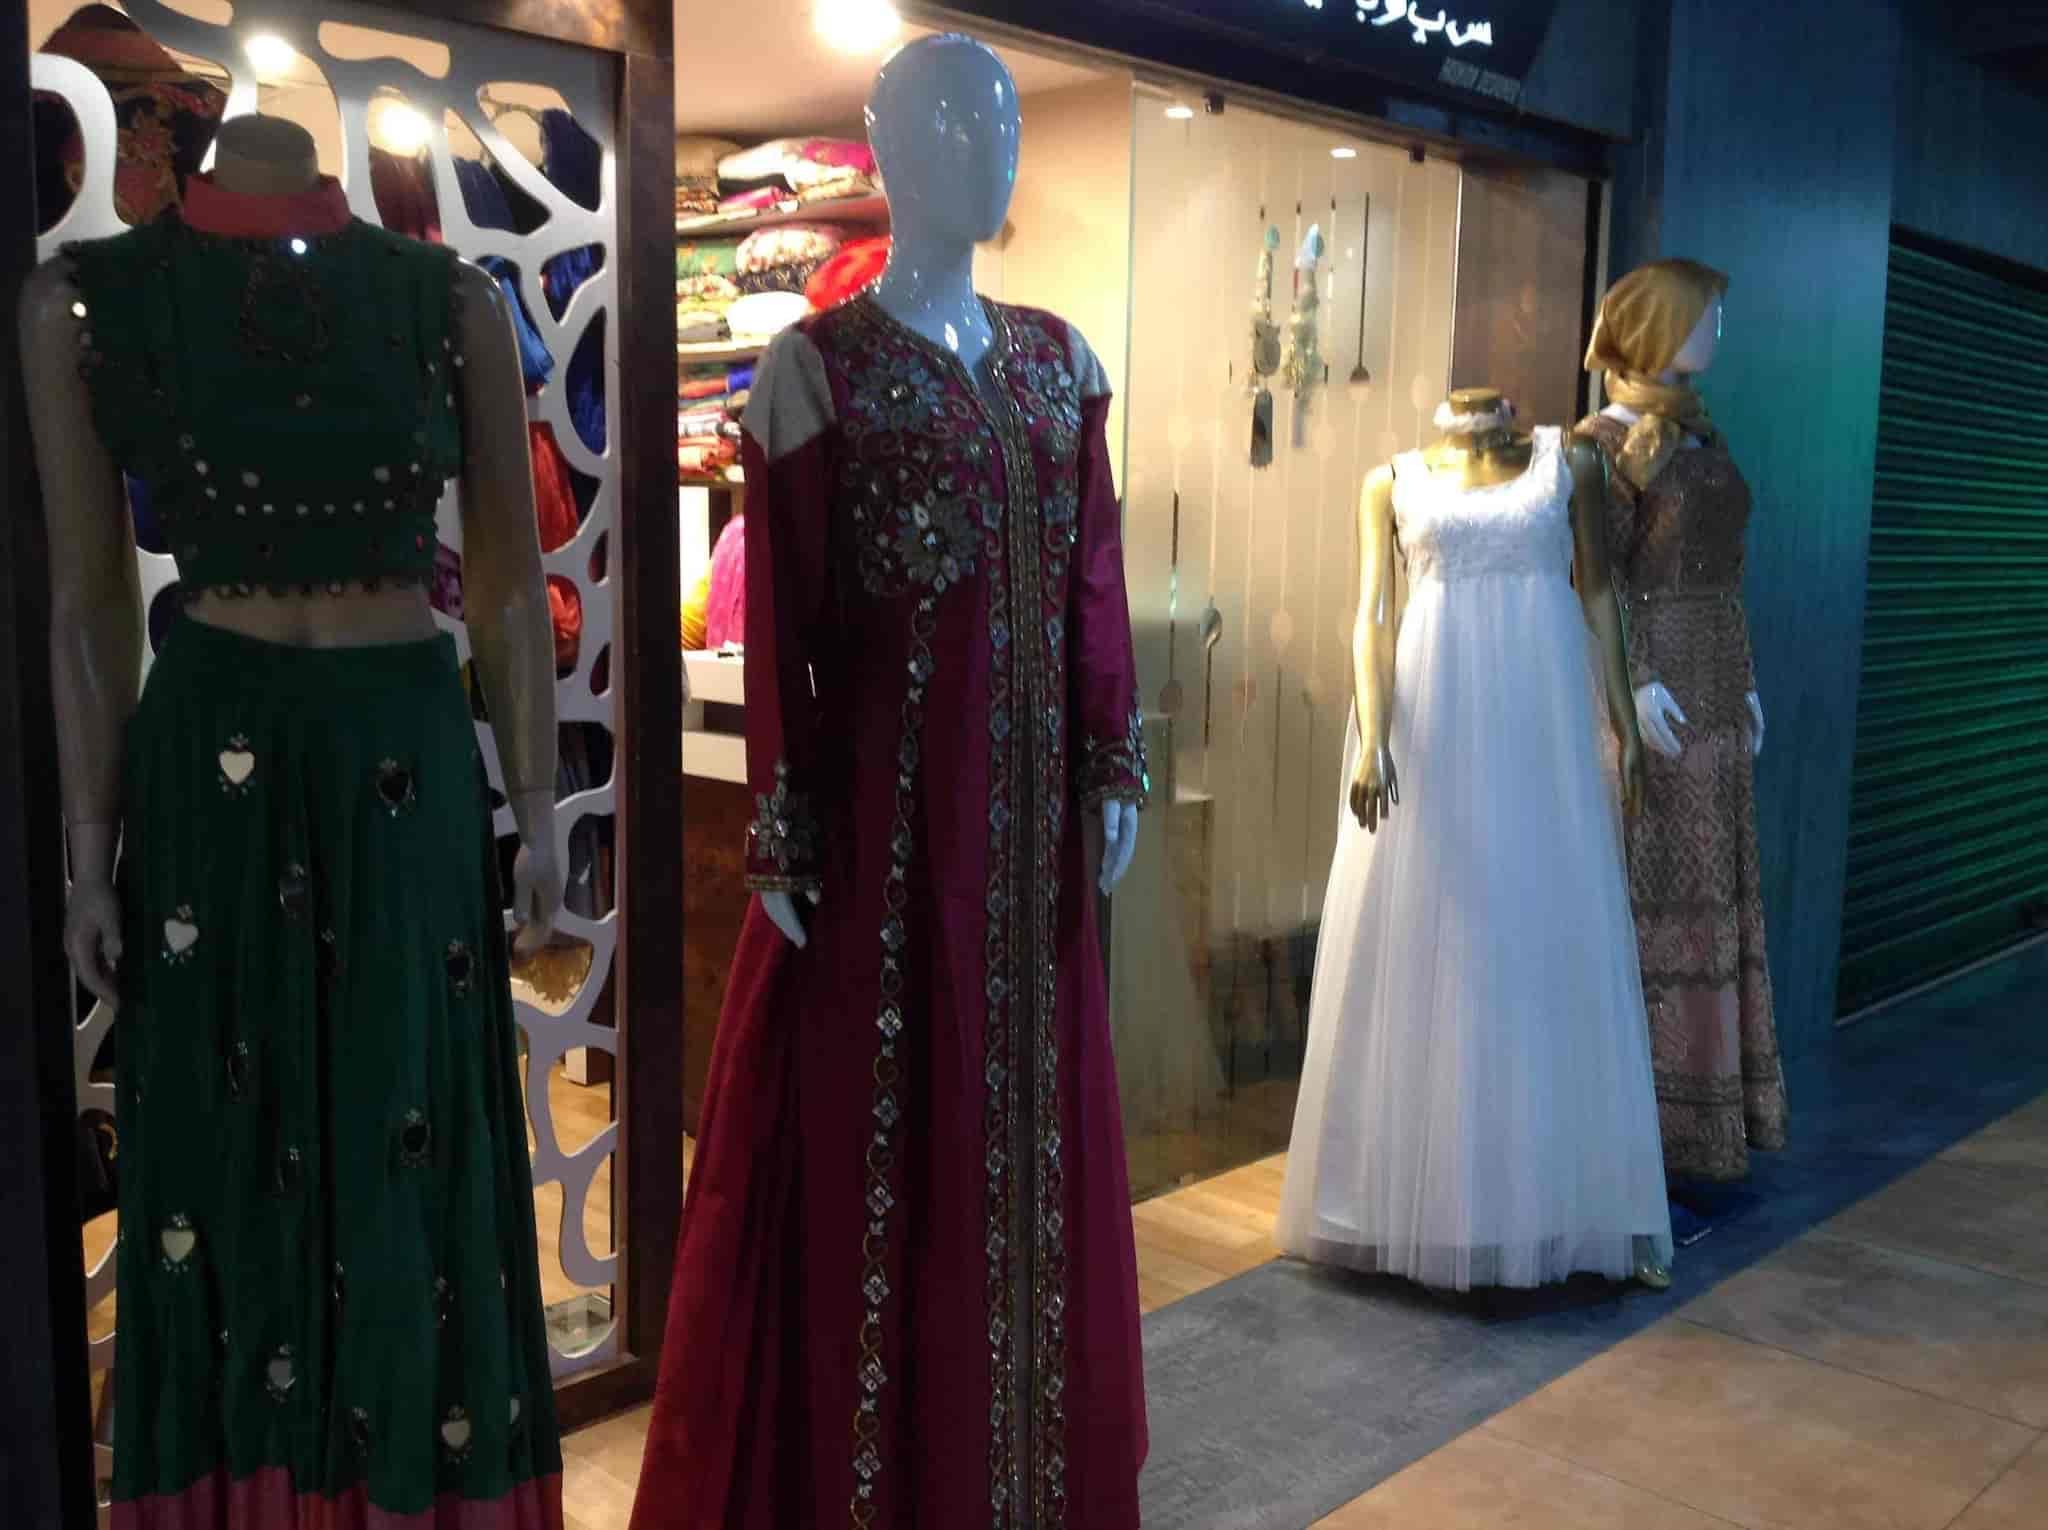 ... Ladies Garments   Spot Light On Style Fashion Designer Photos, Ks Rao  Road, Mangalore ...